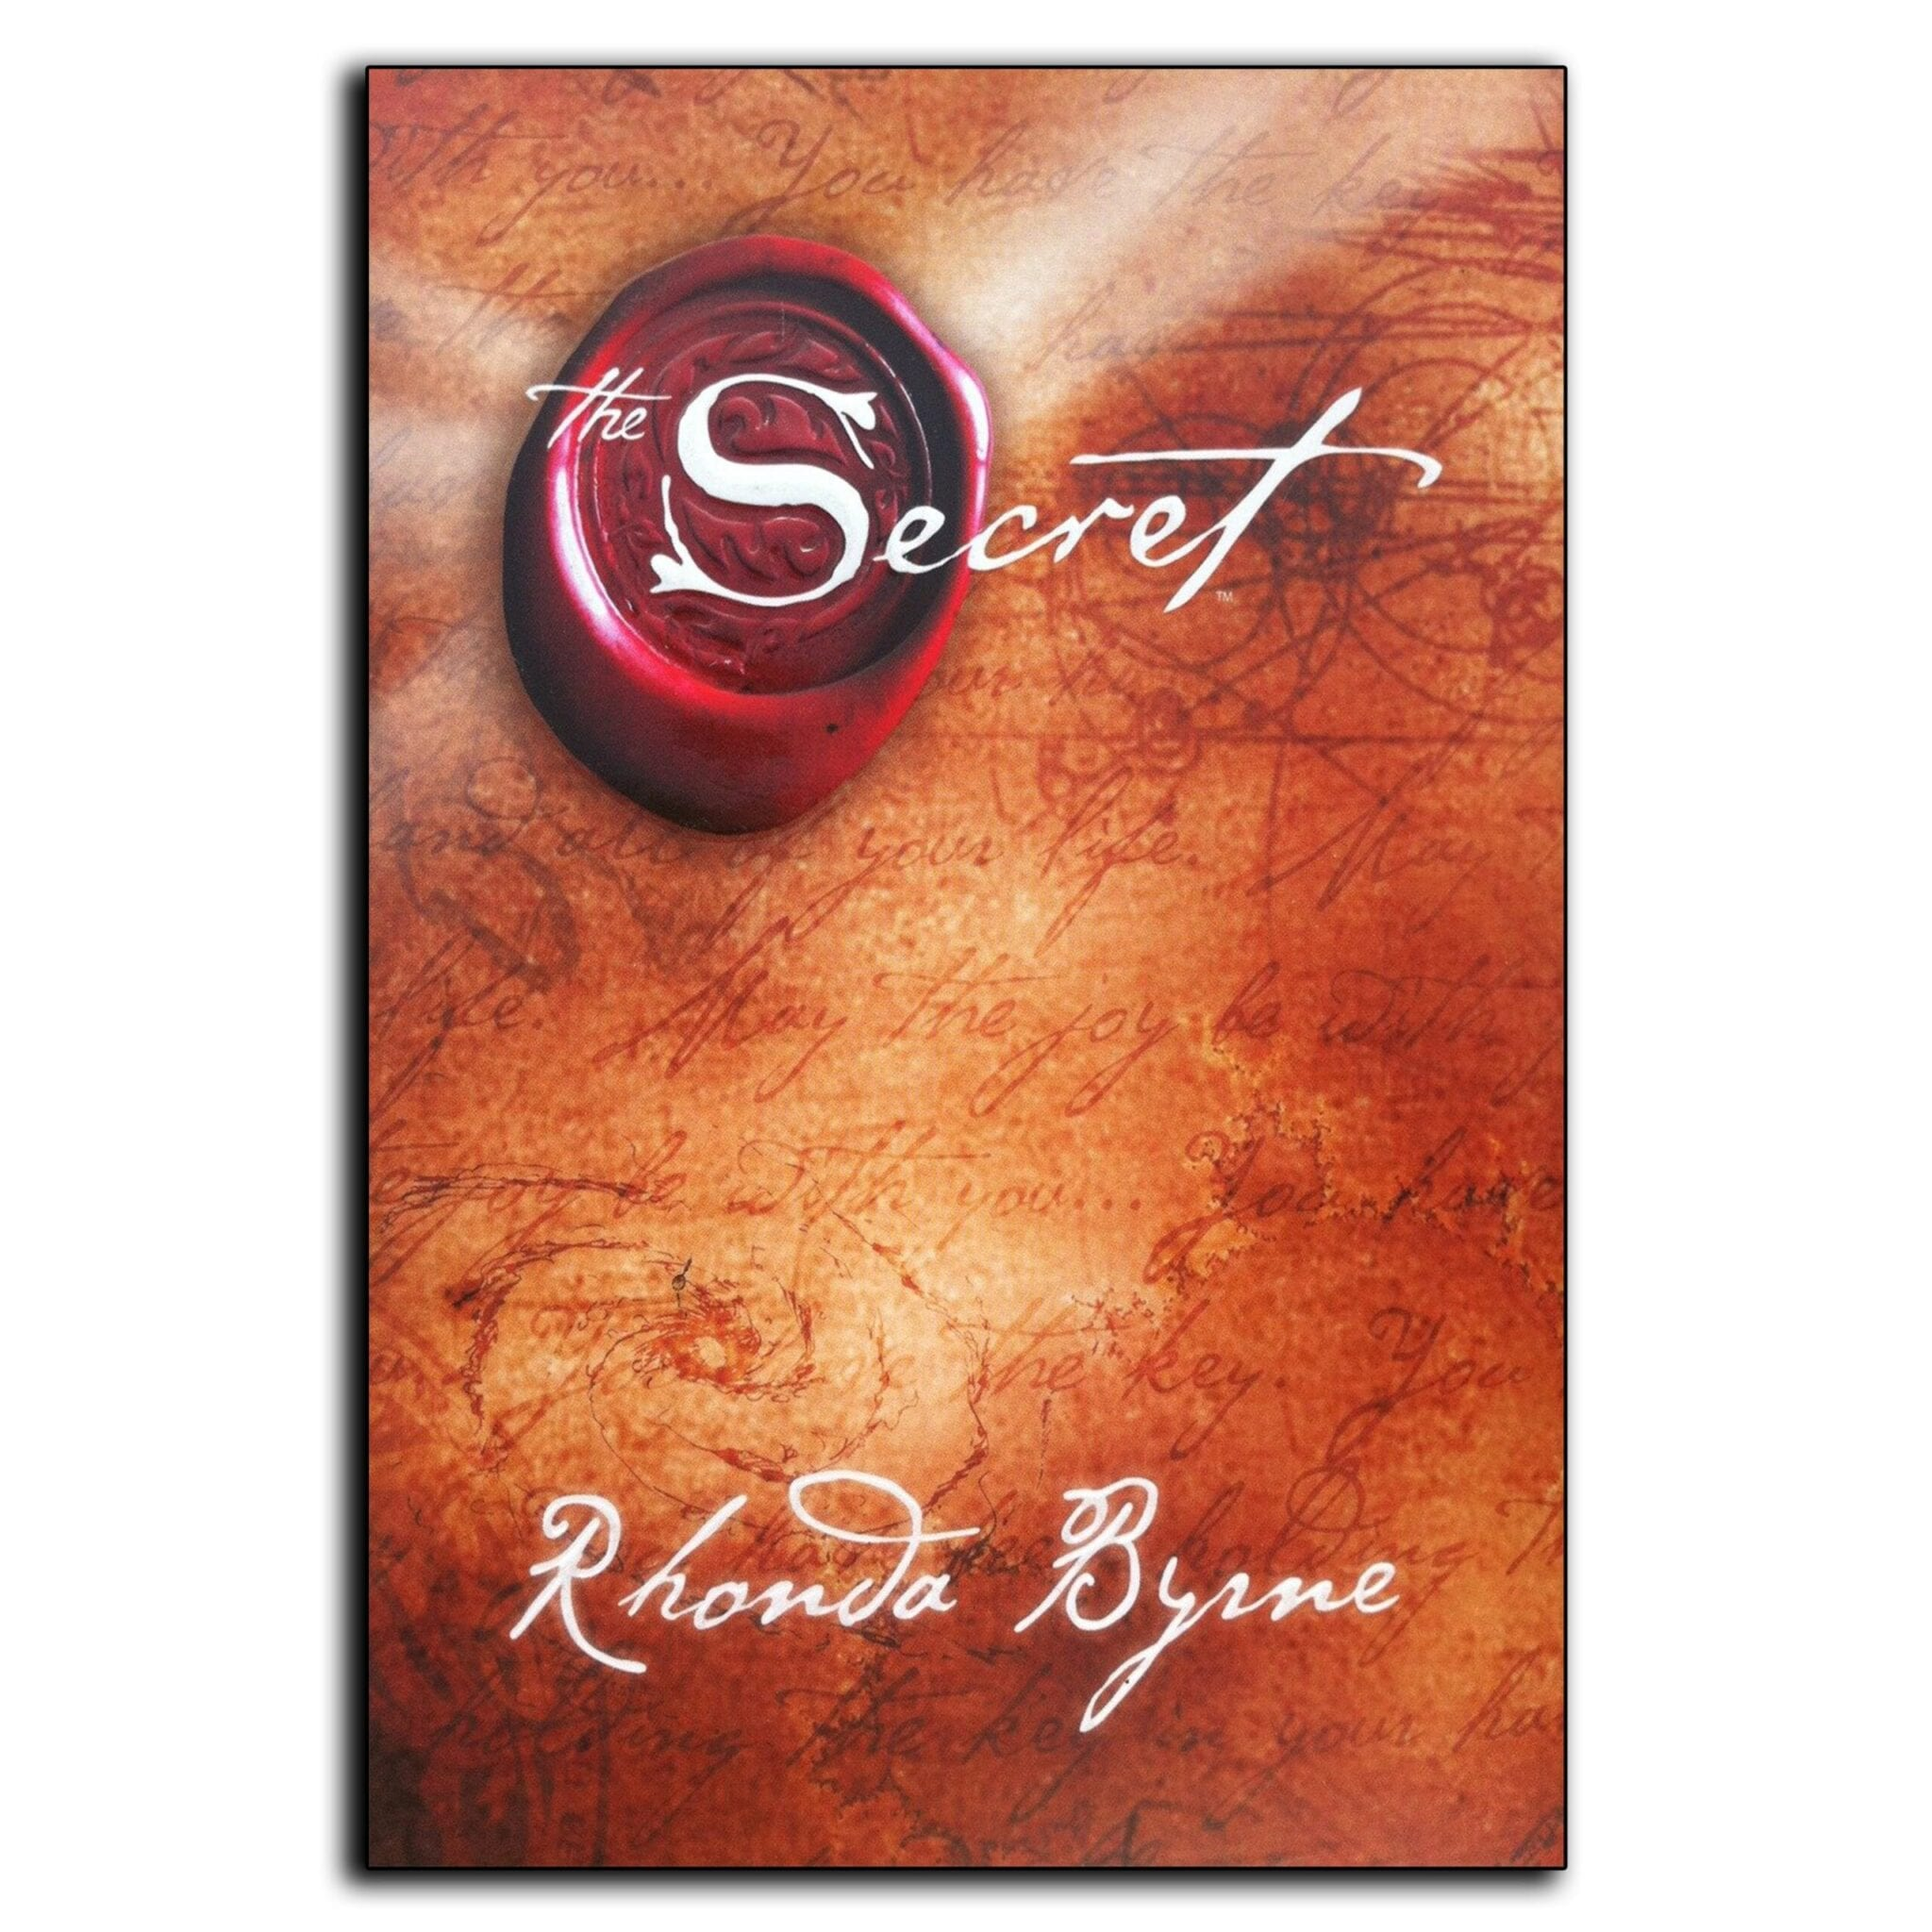 What Is My Secret?